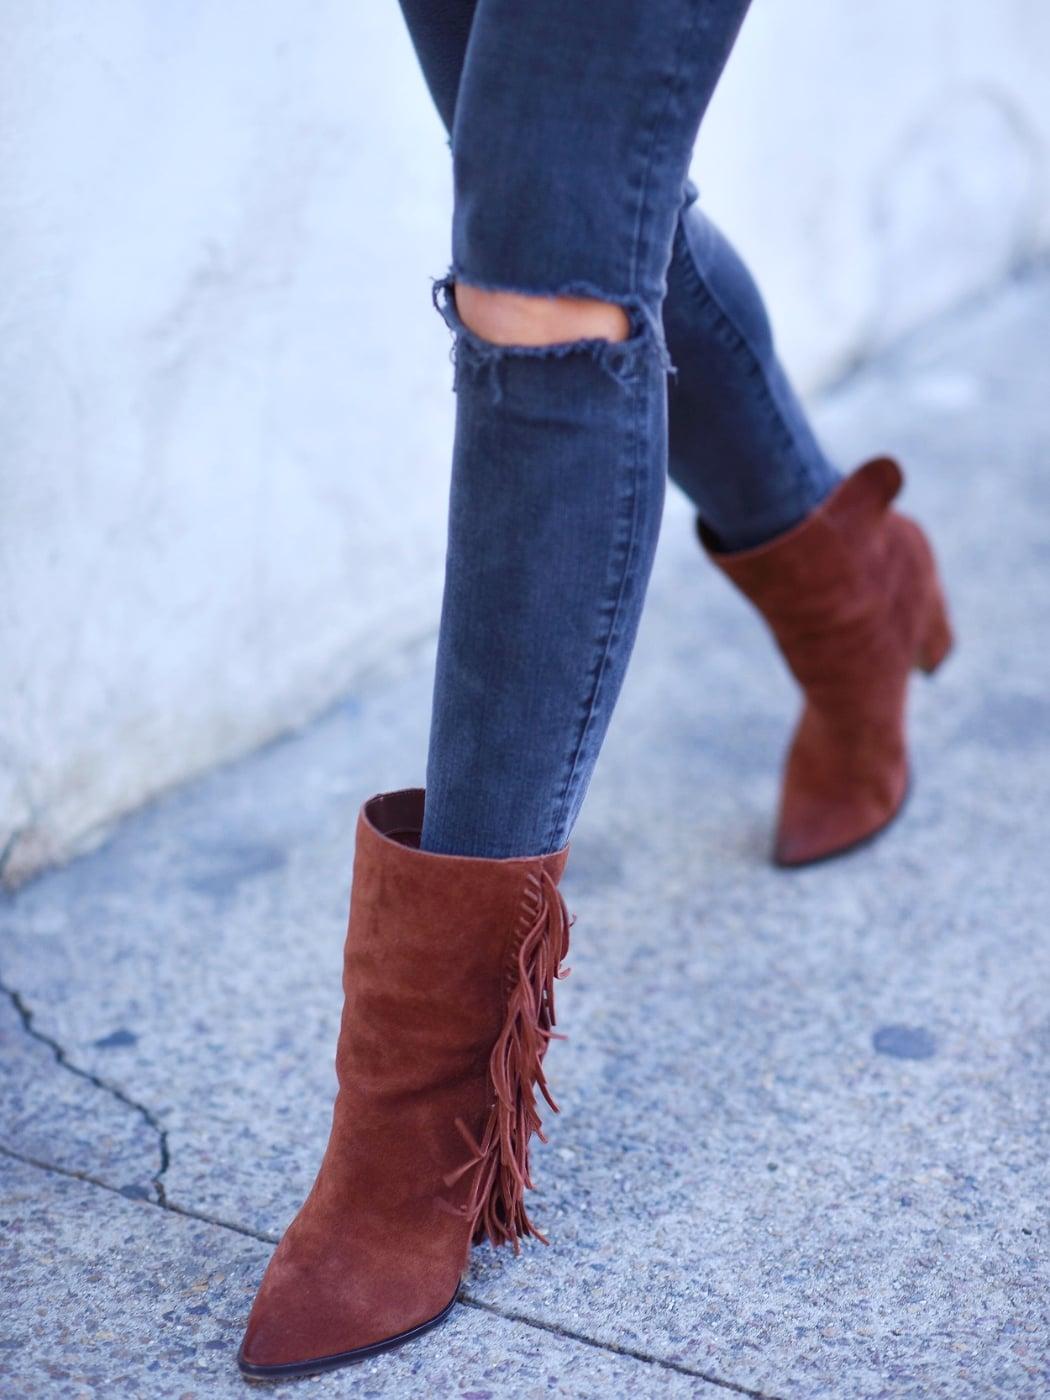 DolceVitaShoes_Fashion_FashionBlogger_Streetstyle_LucysWhims_Faux Fur_SanDiego_SaintLaurent.jpg